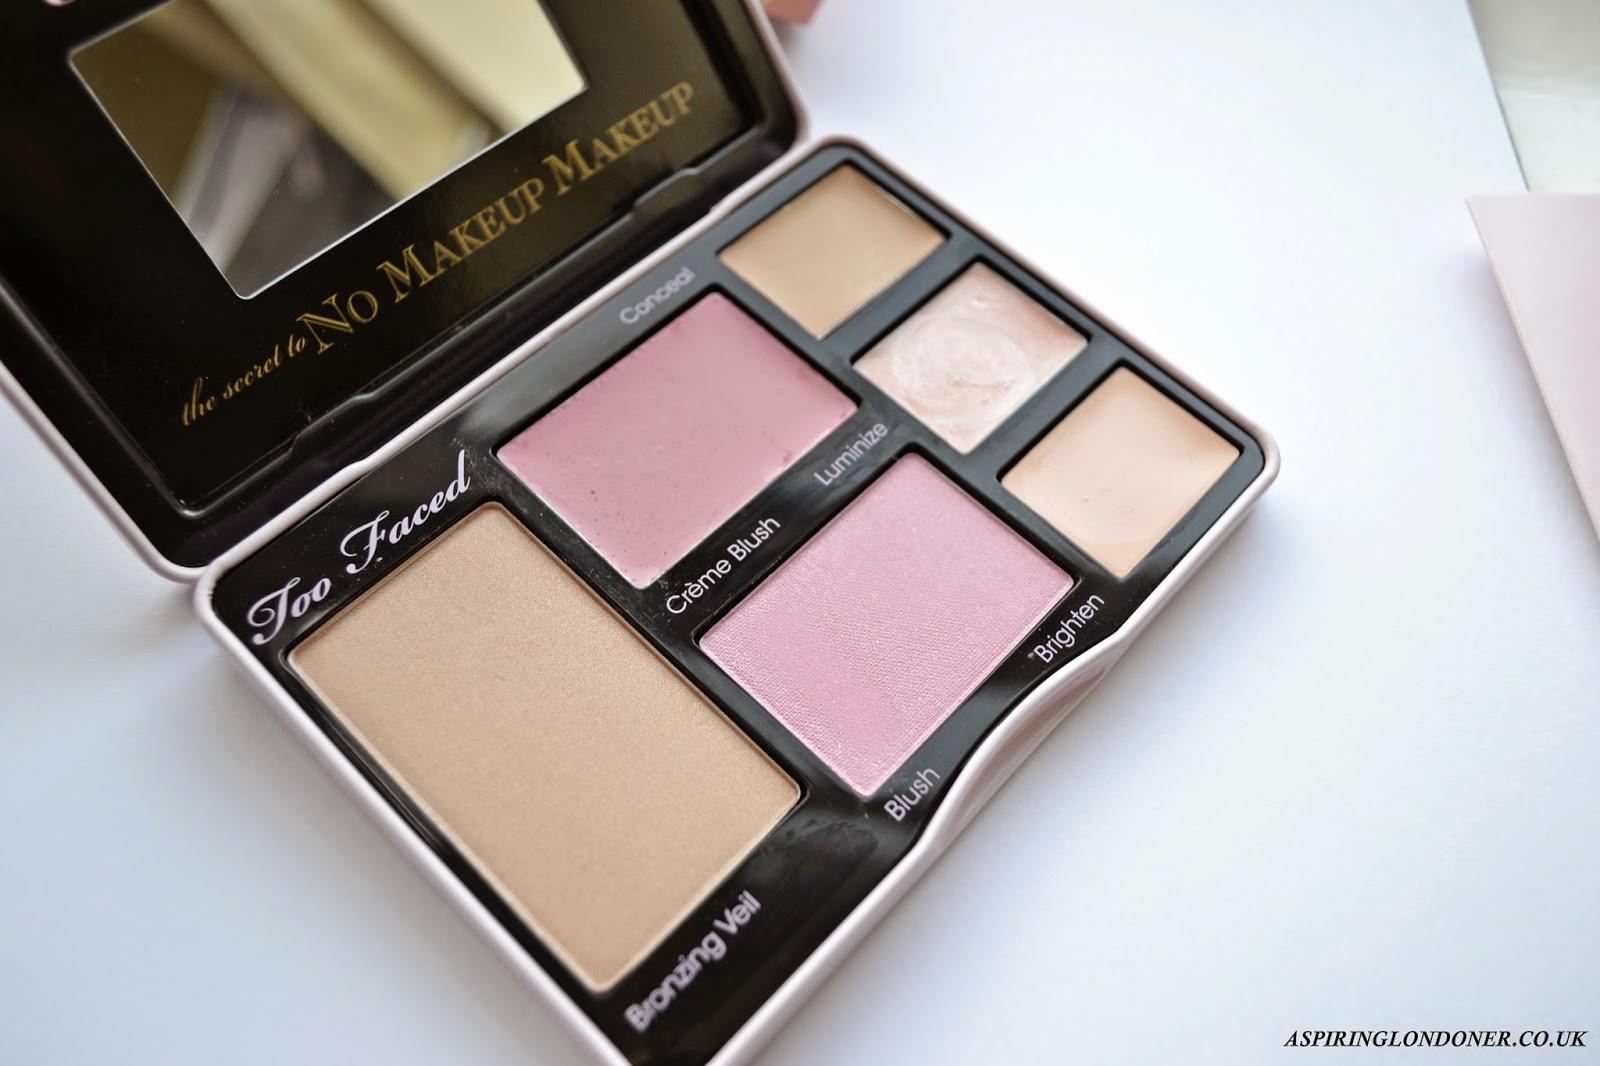 Too Faced No Makeup Makeup Palette Review - Aspiring Londoner